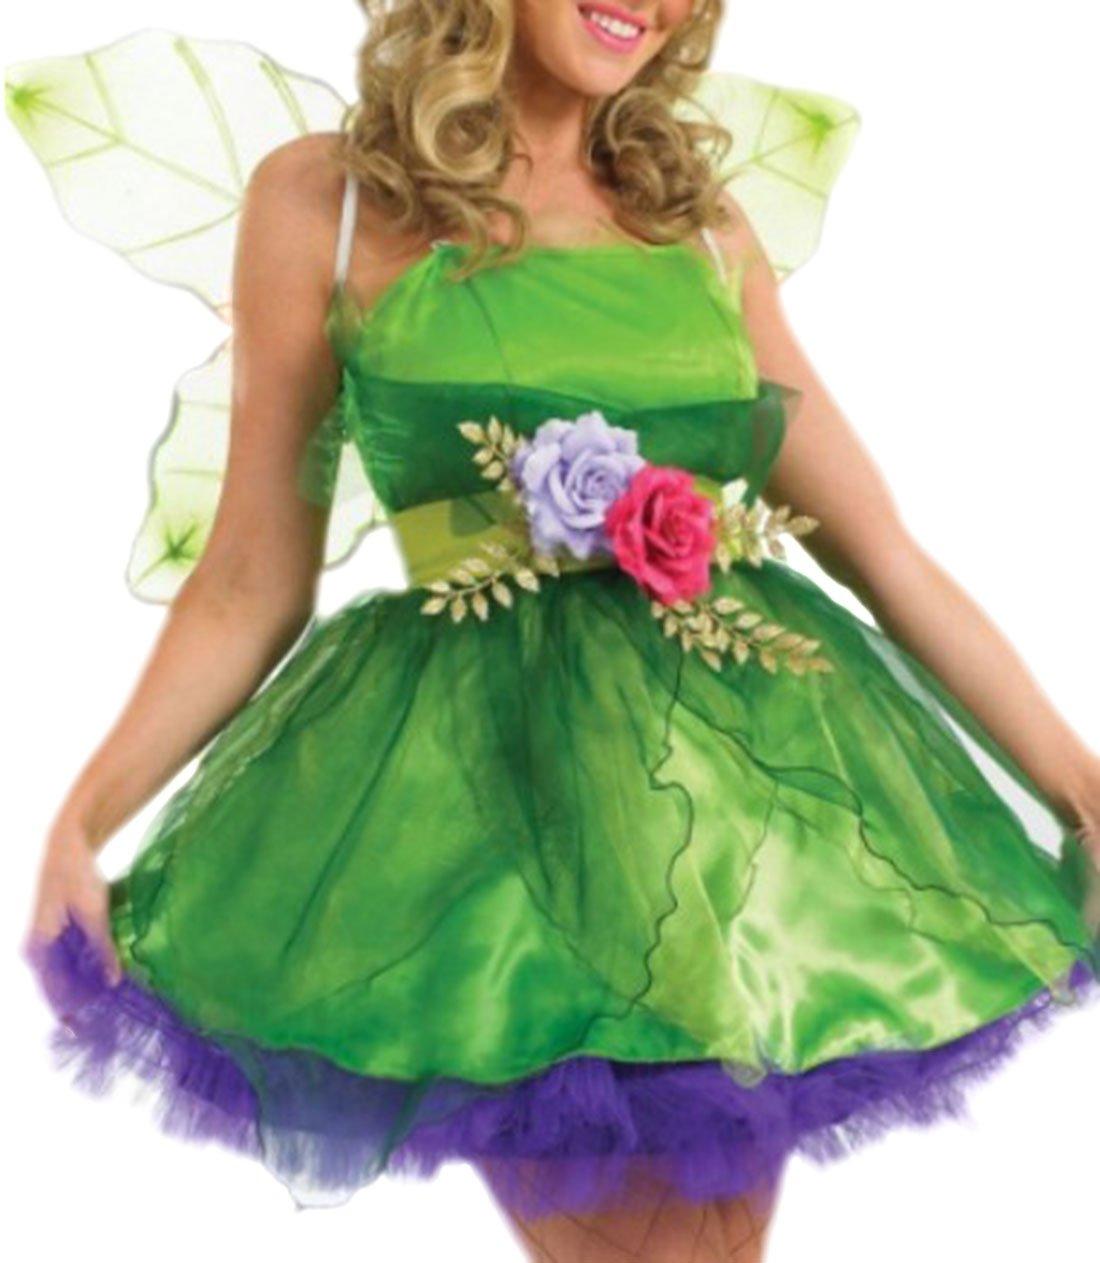 Karnevalsbud - Damen Märchenfee Zauberprinzessin Kostüm, Kostüm, Kostüm, S, Grün e11410